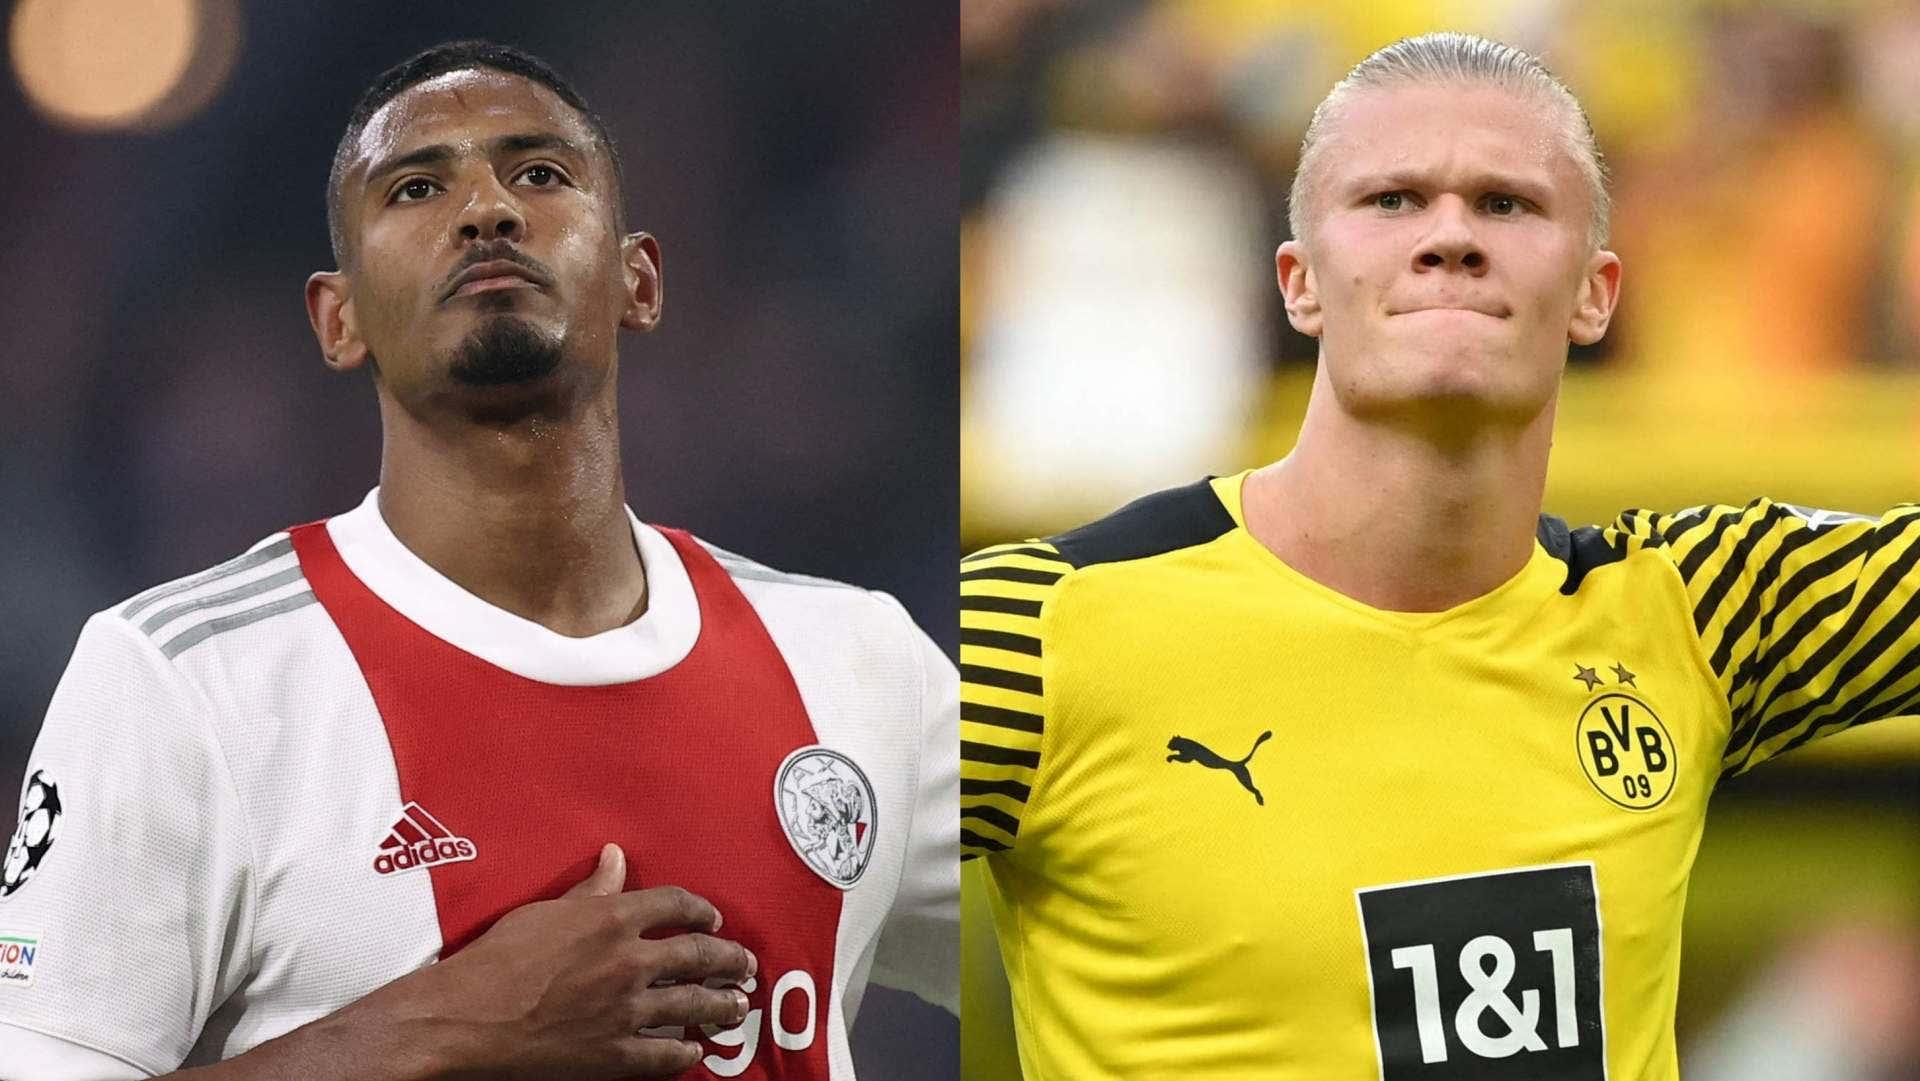 Ajax Amsterdam vs. BVB (Borussia Dortmund) heute live: Die Gruppenphase der Champions League im TV und LIVE-STREAM | Goal.com